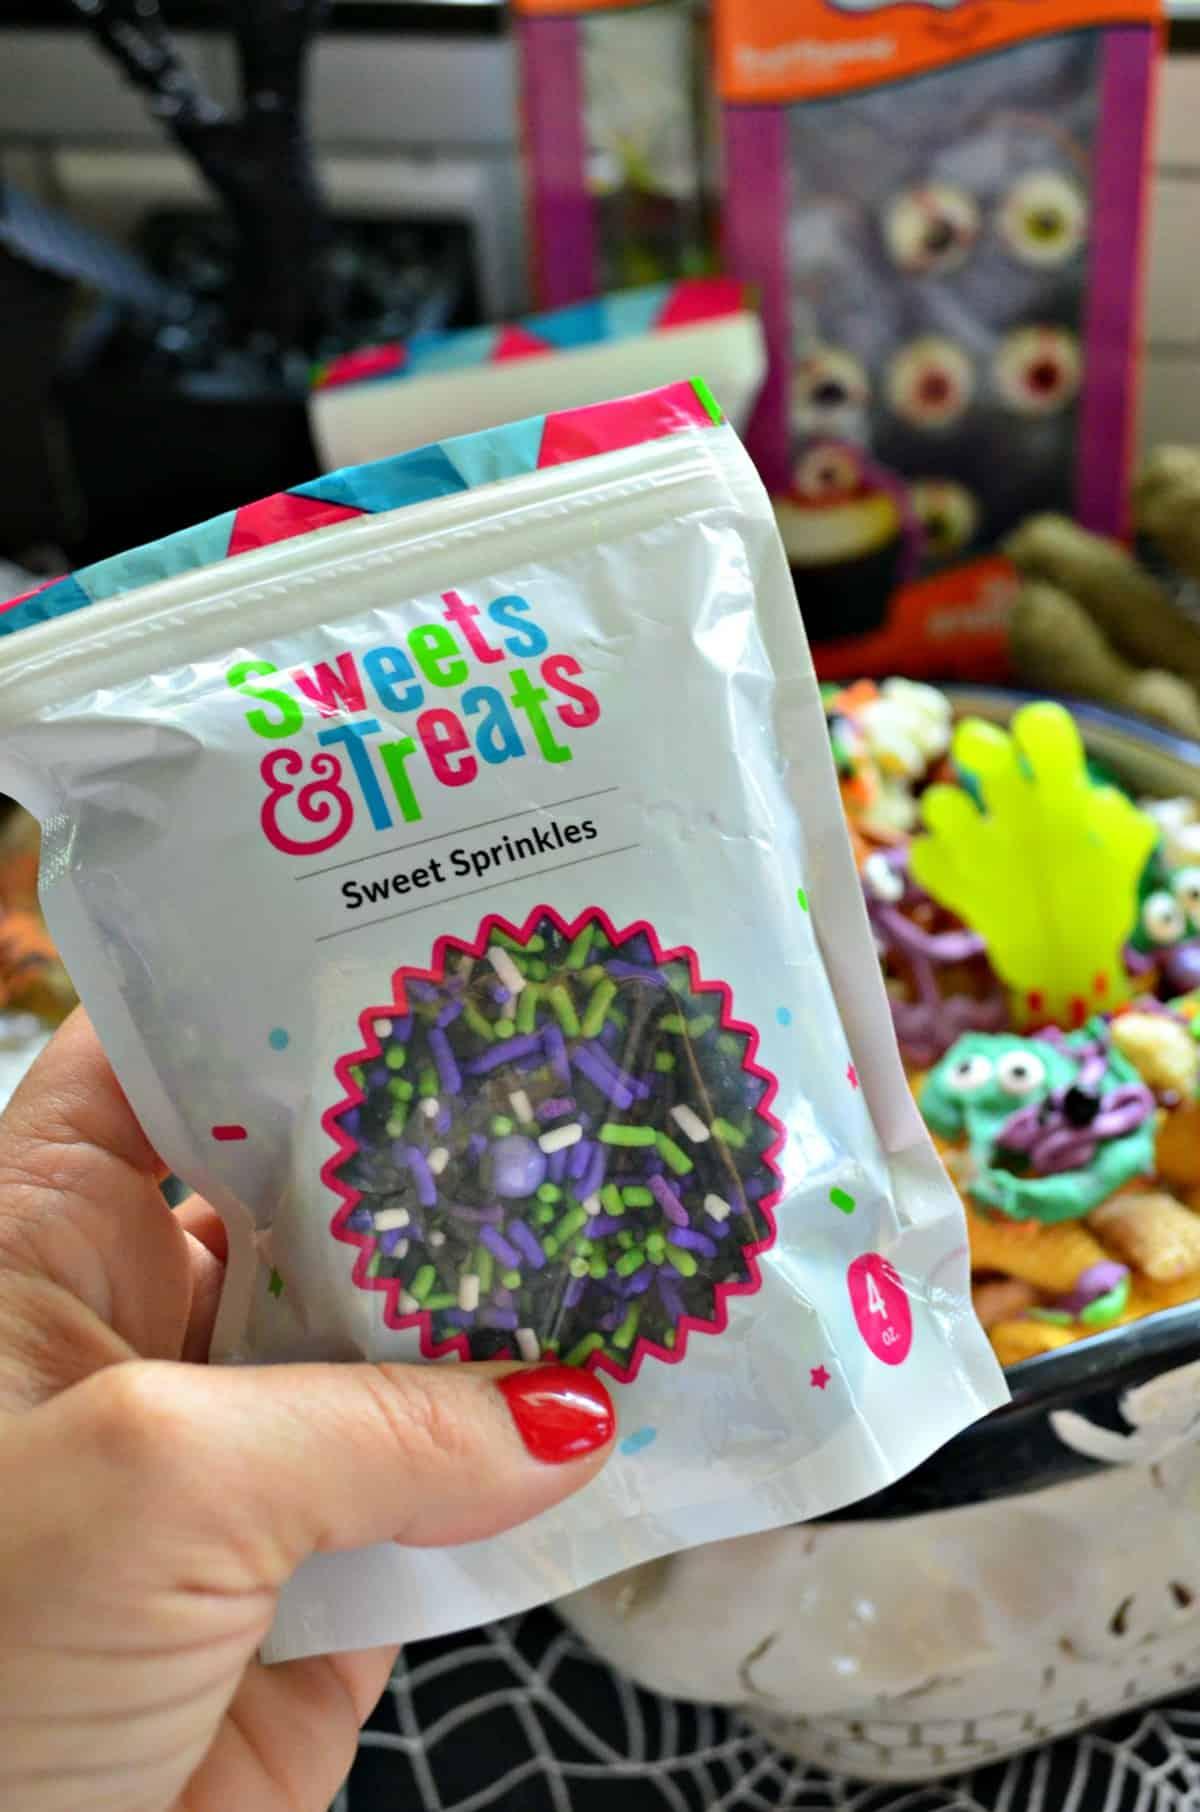 bag of purple, green, and black Sweets & Treats Sweet sprinkles.